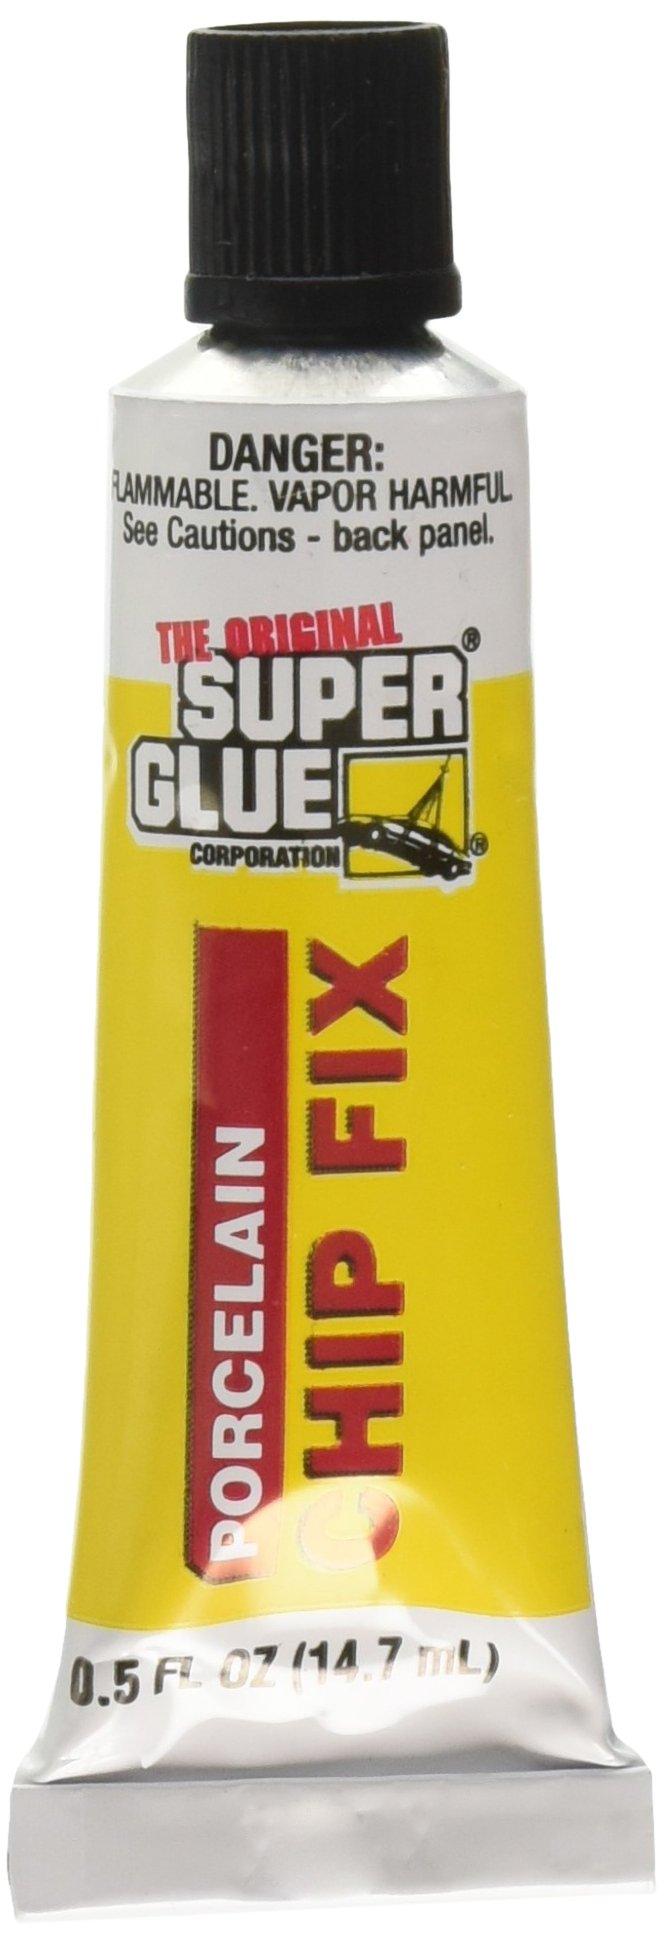 Super Glue The Original 19061 Porcelain Repair